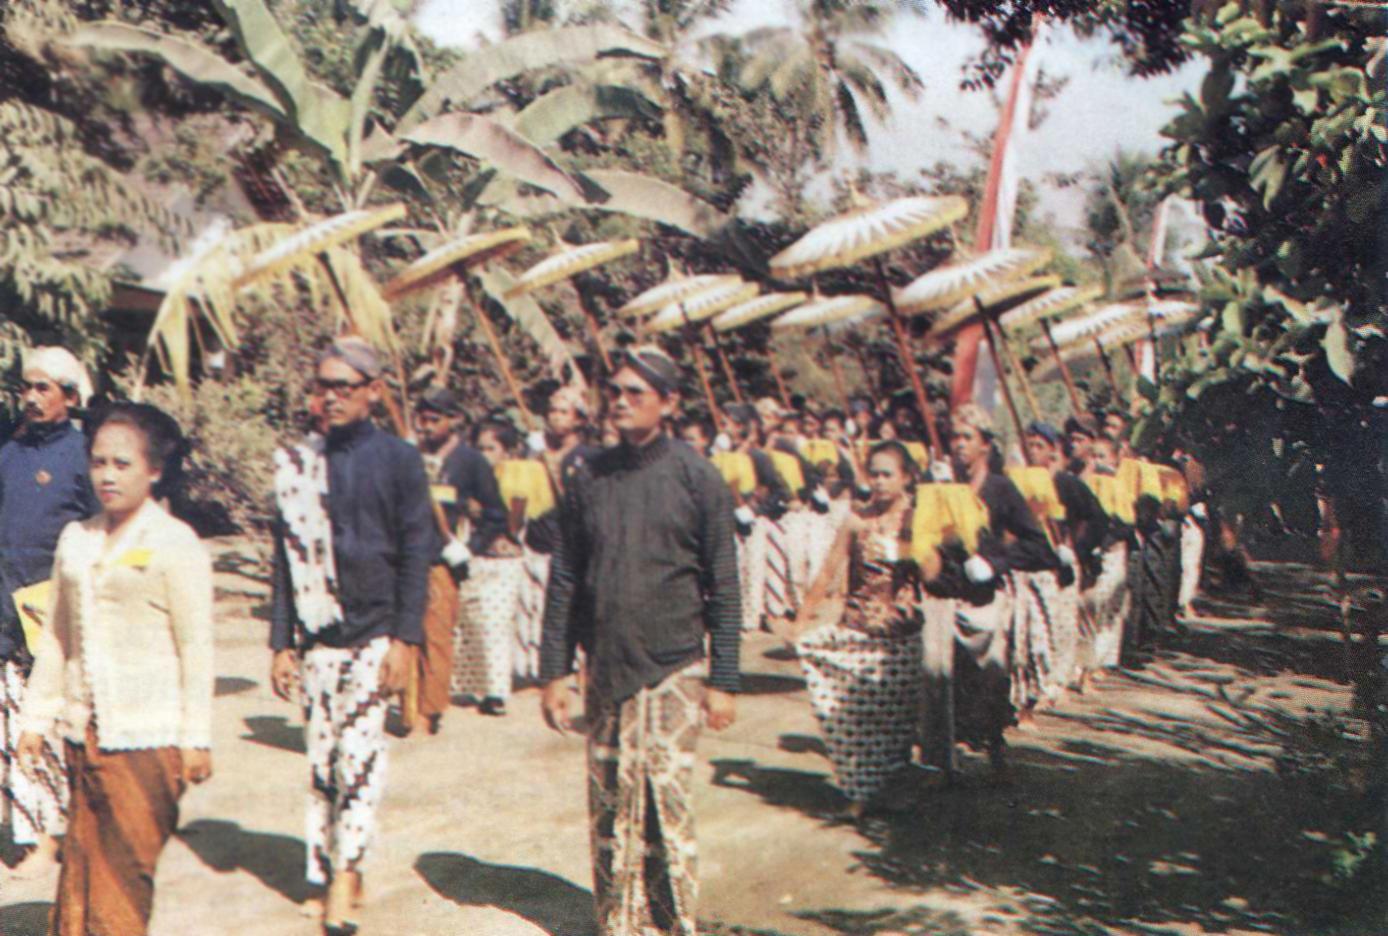 Sesaji Sri Aji Jayabaya Pusaka Jawatimuran Upacara Tradisional 1 Sura